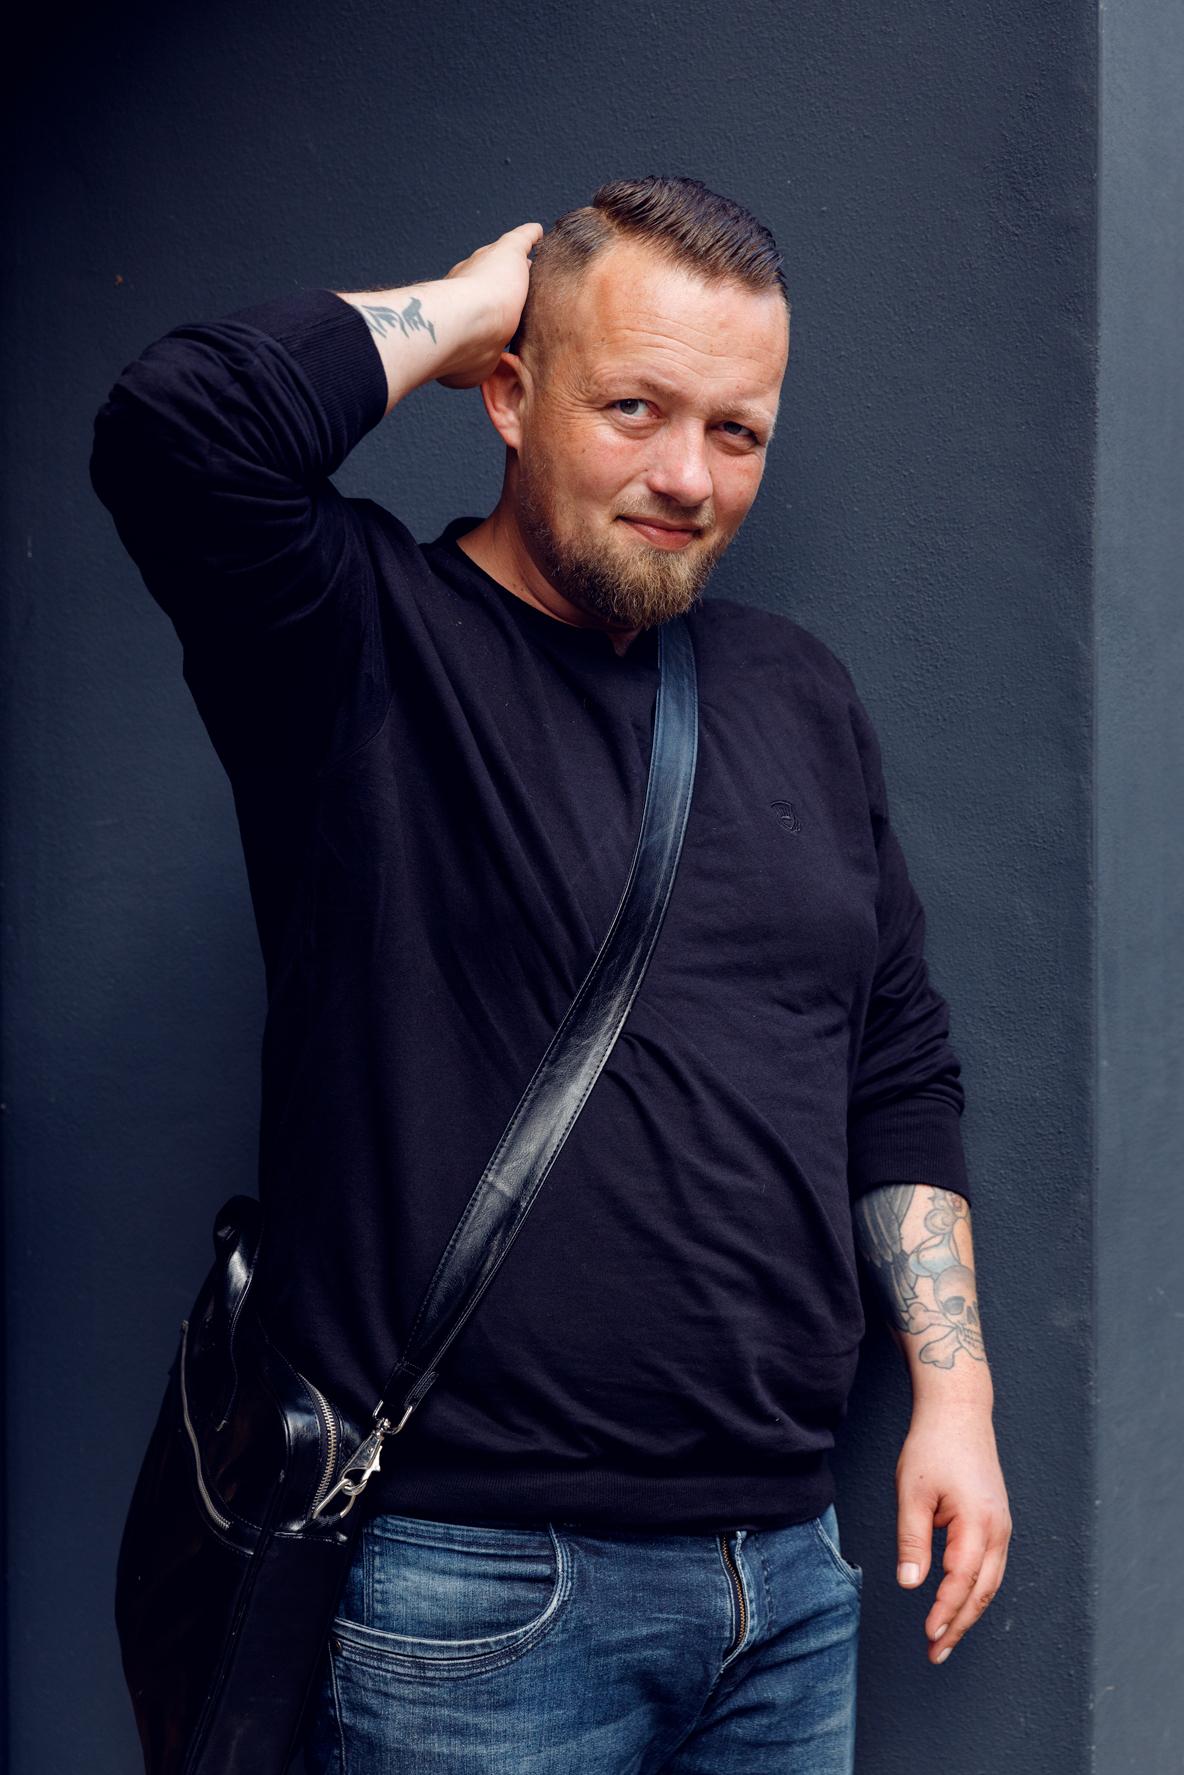 "<span class=""rodt"">Mere ungt, mindre støvet:</span> Nyt Randers-lokalmedie vil gå den ekstra mil 7"